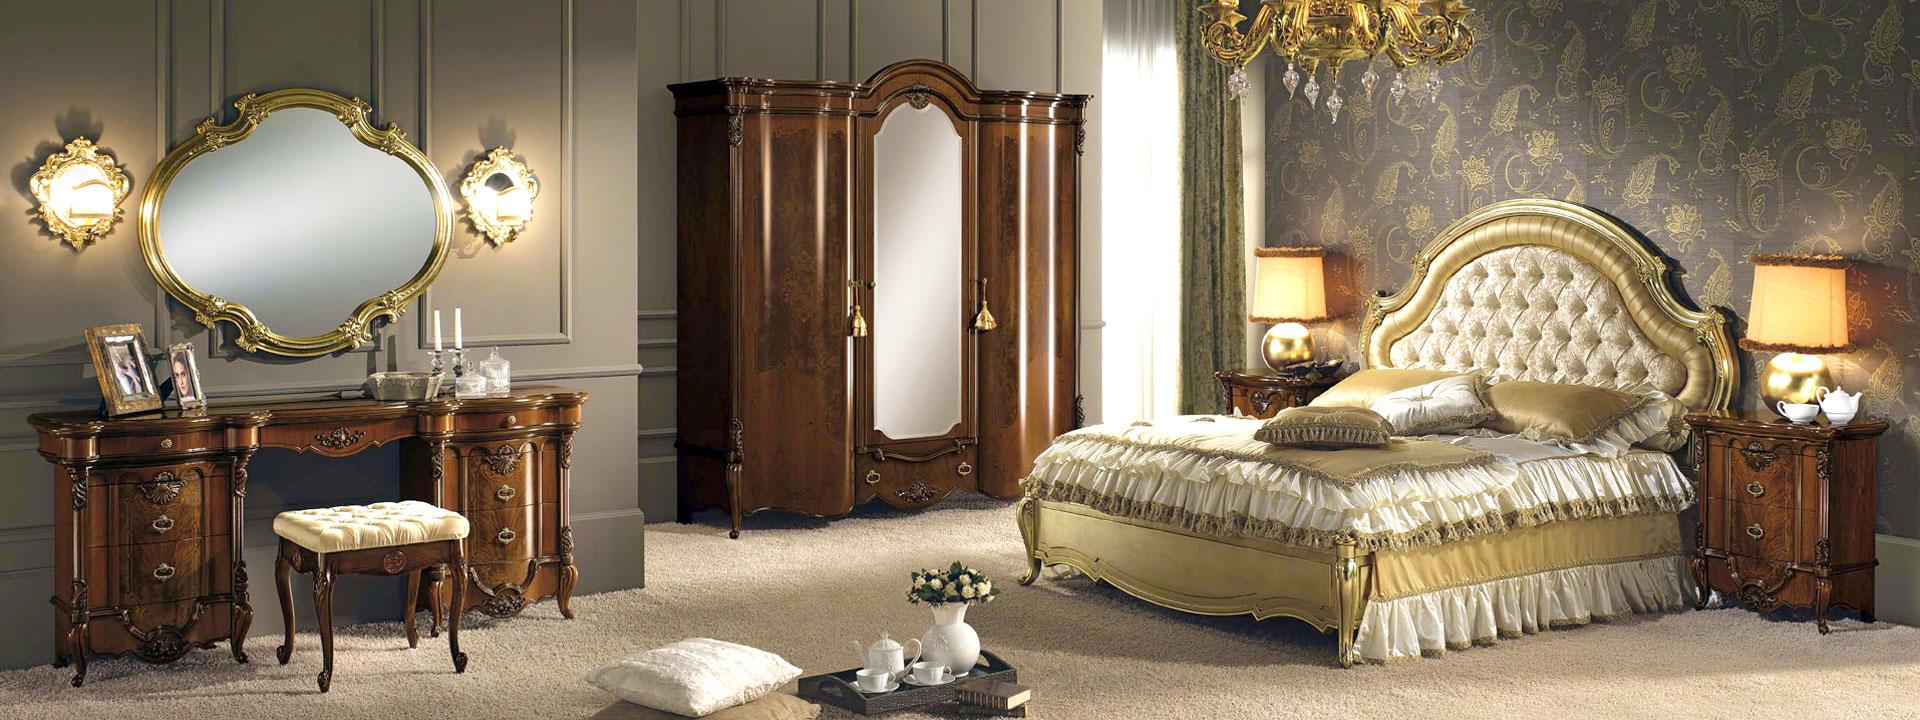 mobila clasica de lux